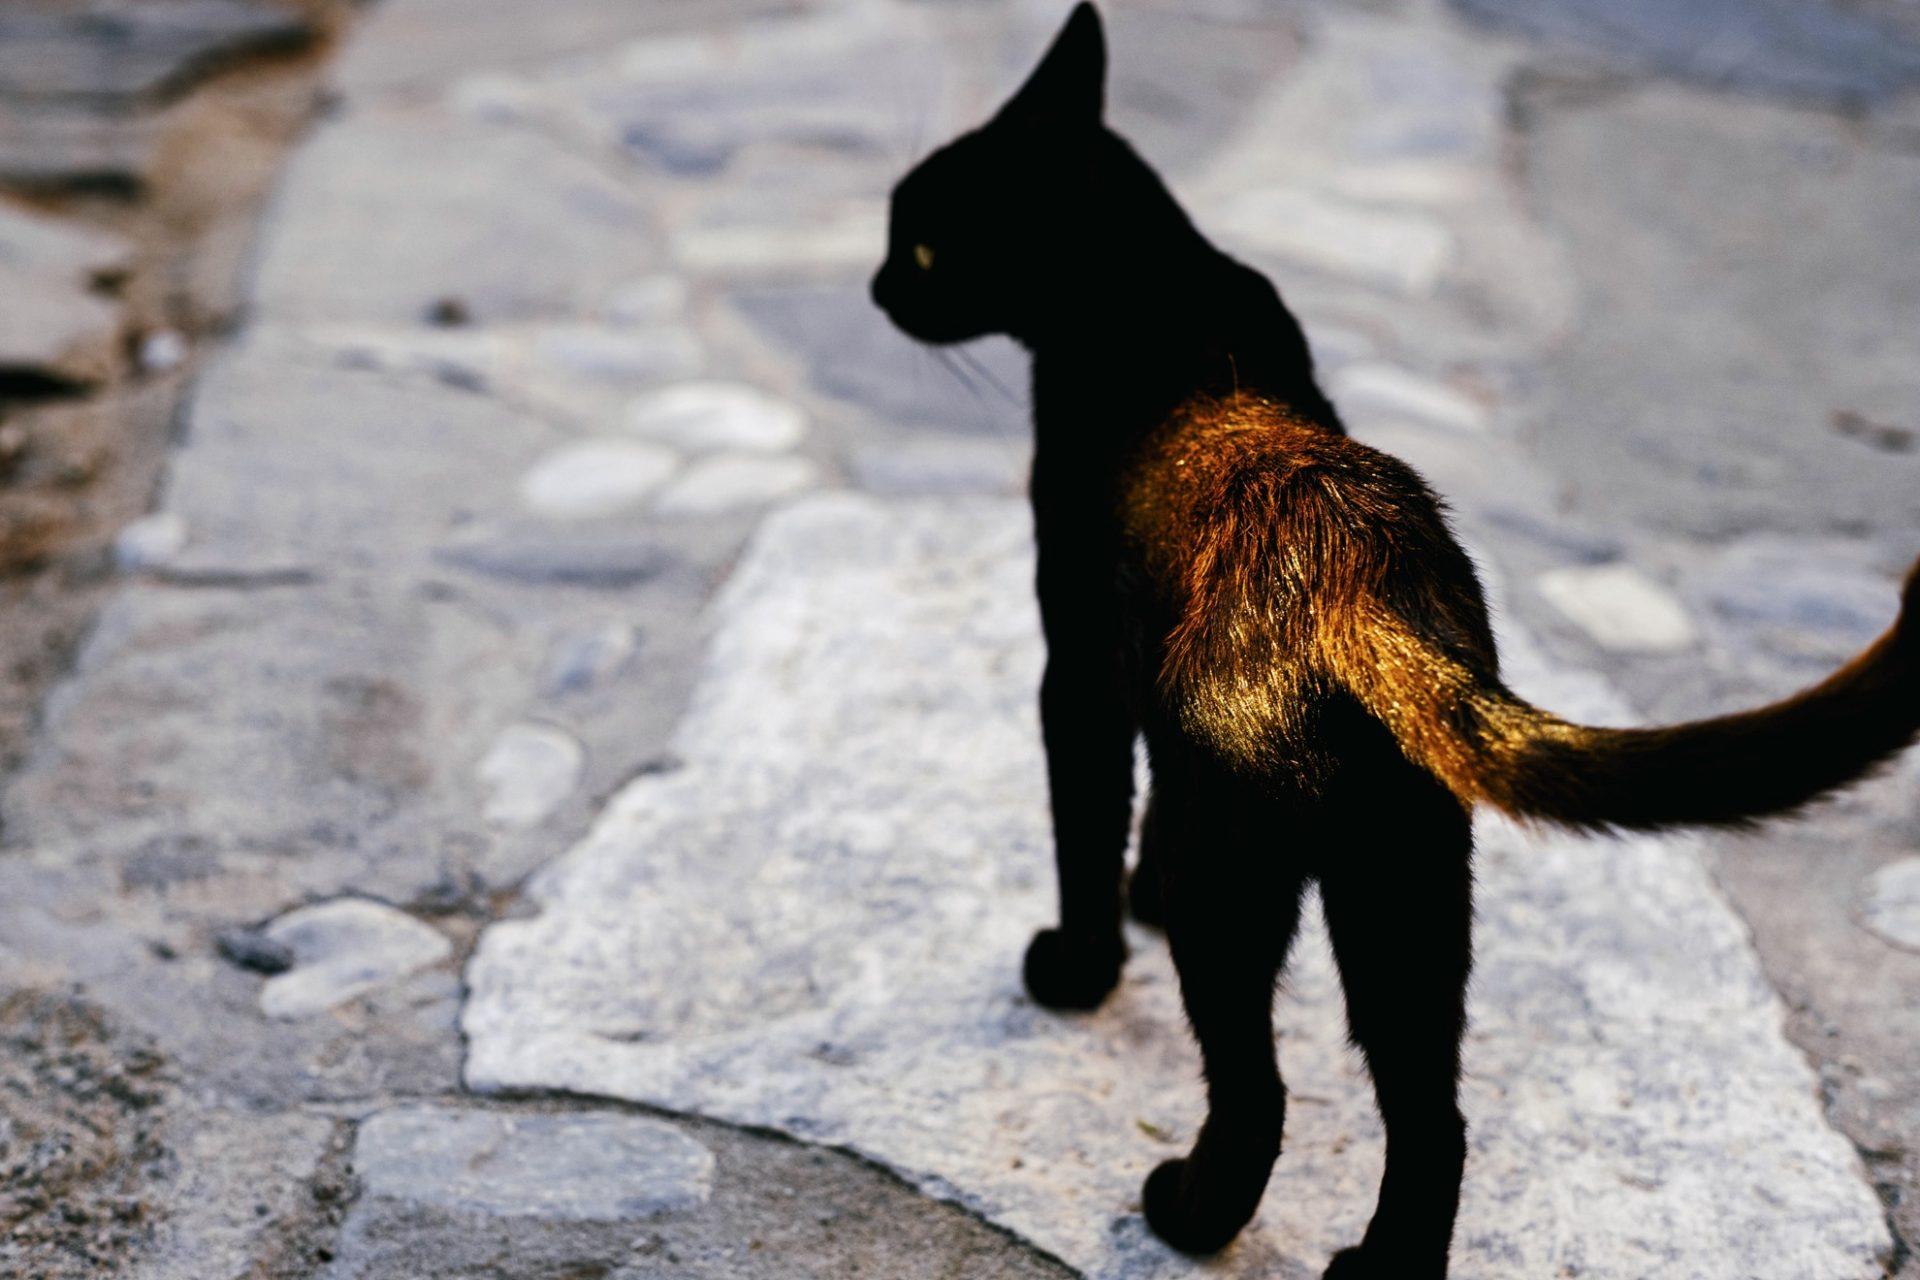 chats grecs@laurentparienti - 10